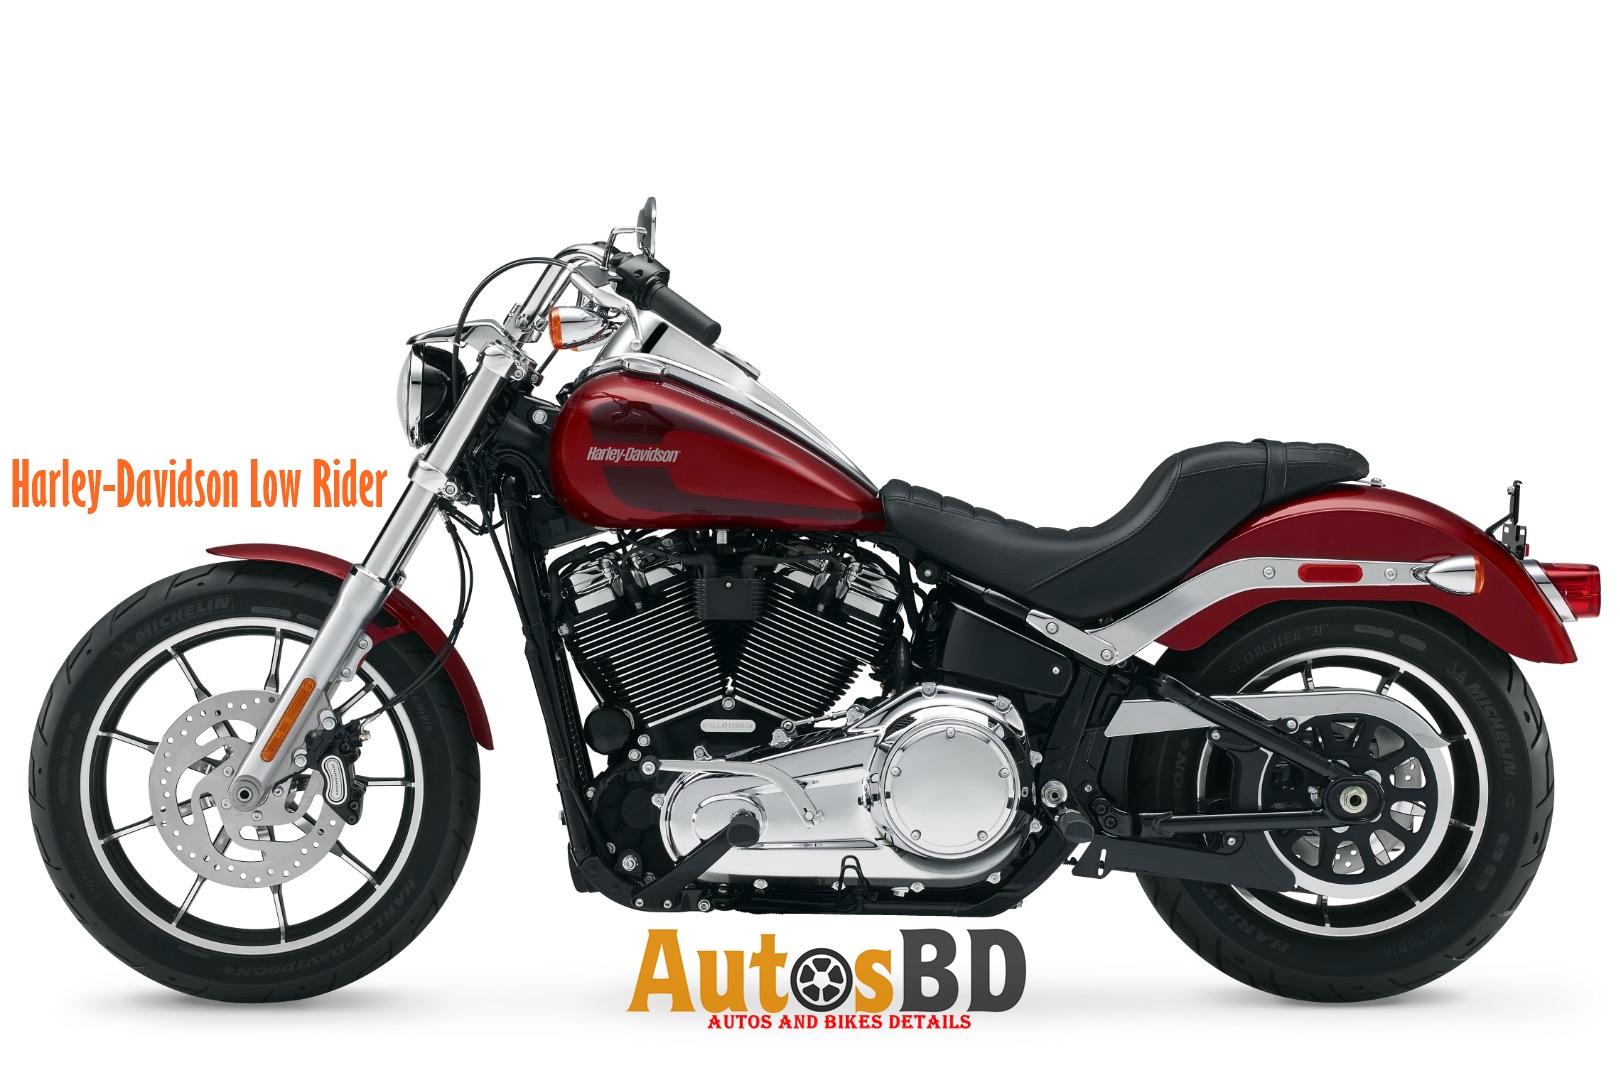 Harley-Davidson Low Rider Specification